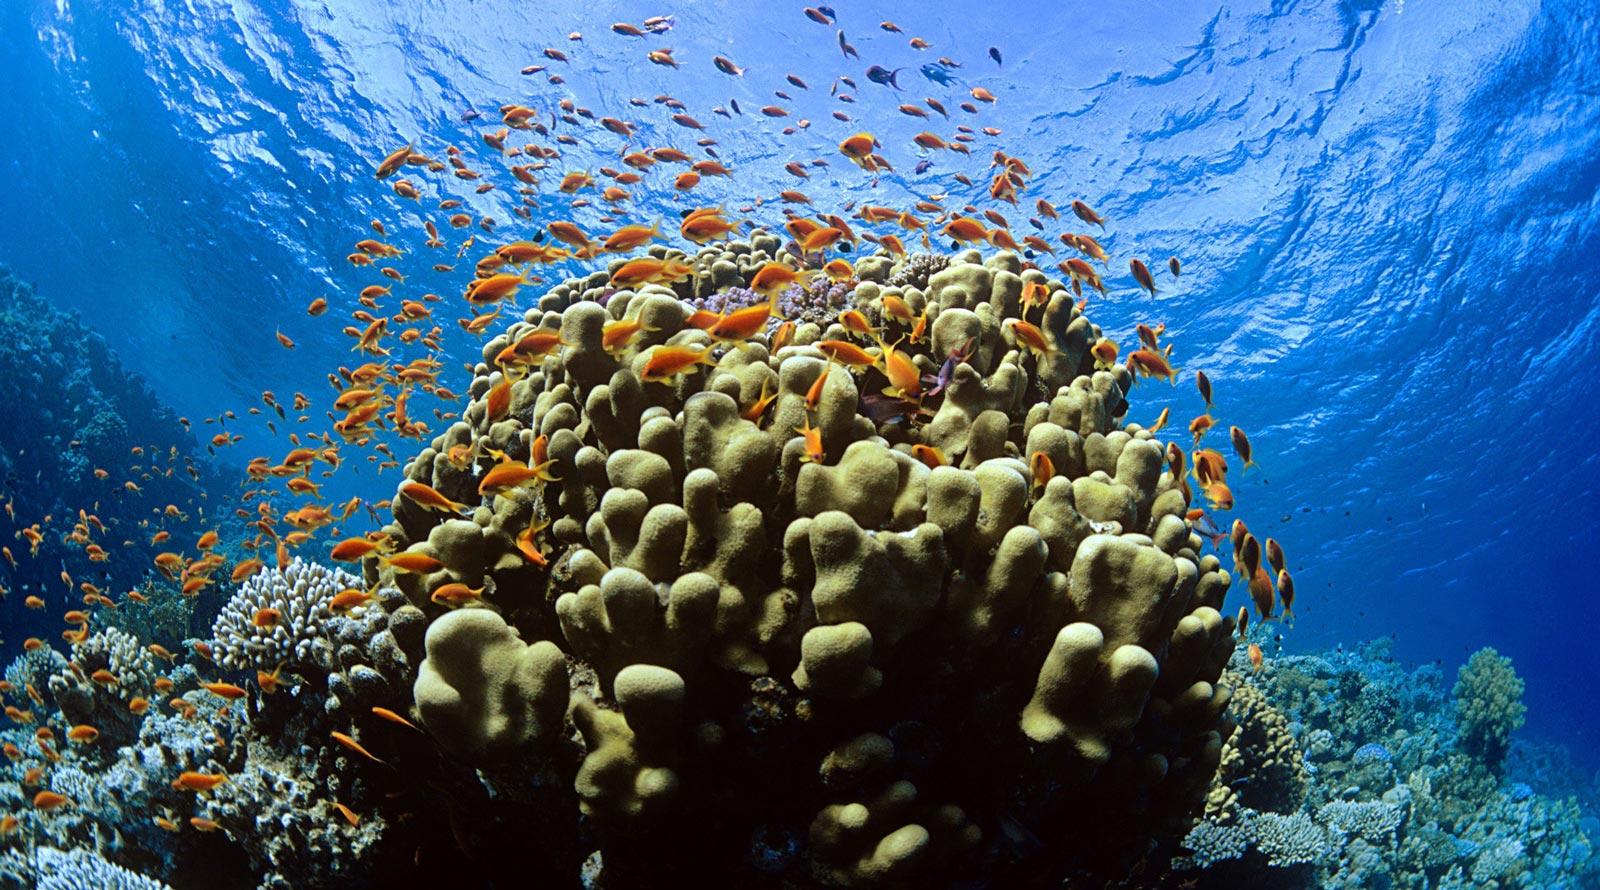 Tubbattaha Reef